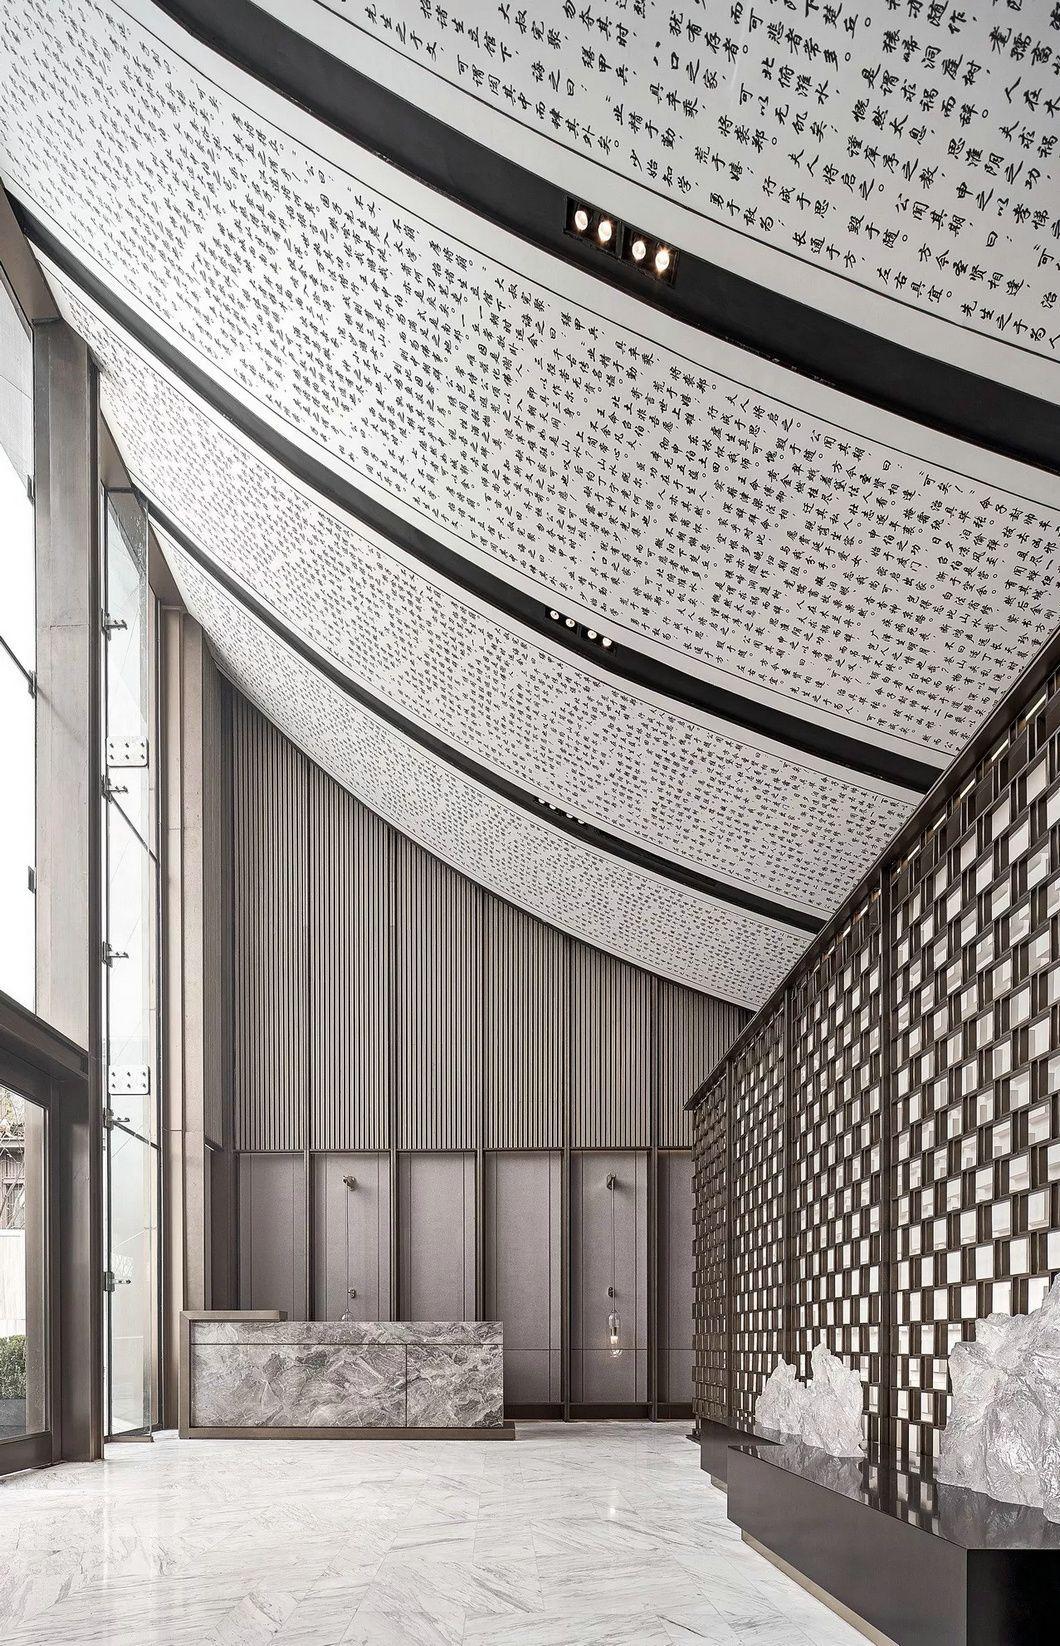 New Ceiling Floor Tiles We Comprehend That It Is